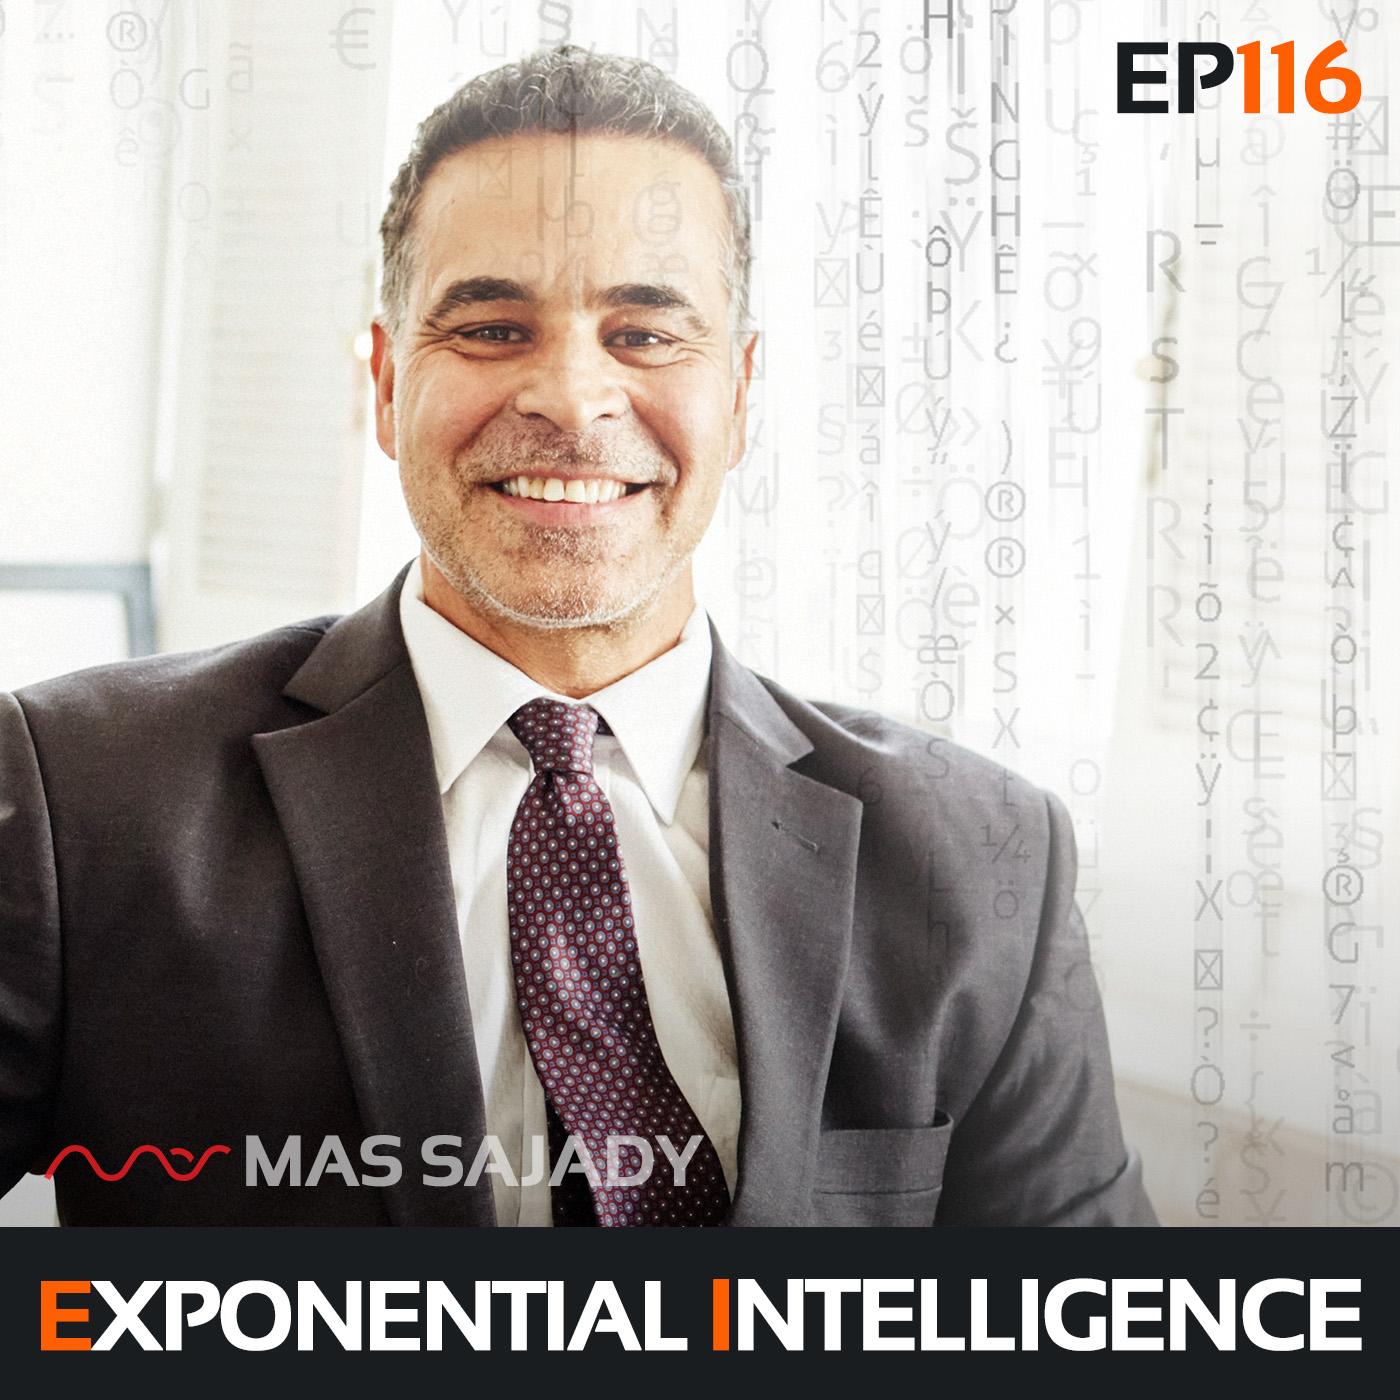 116 episode art - exponential intelligence.jpg